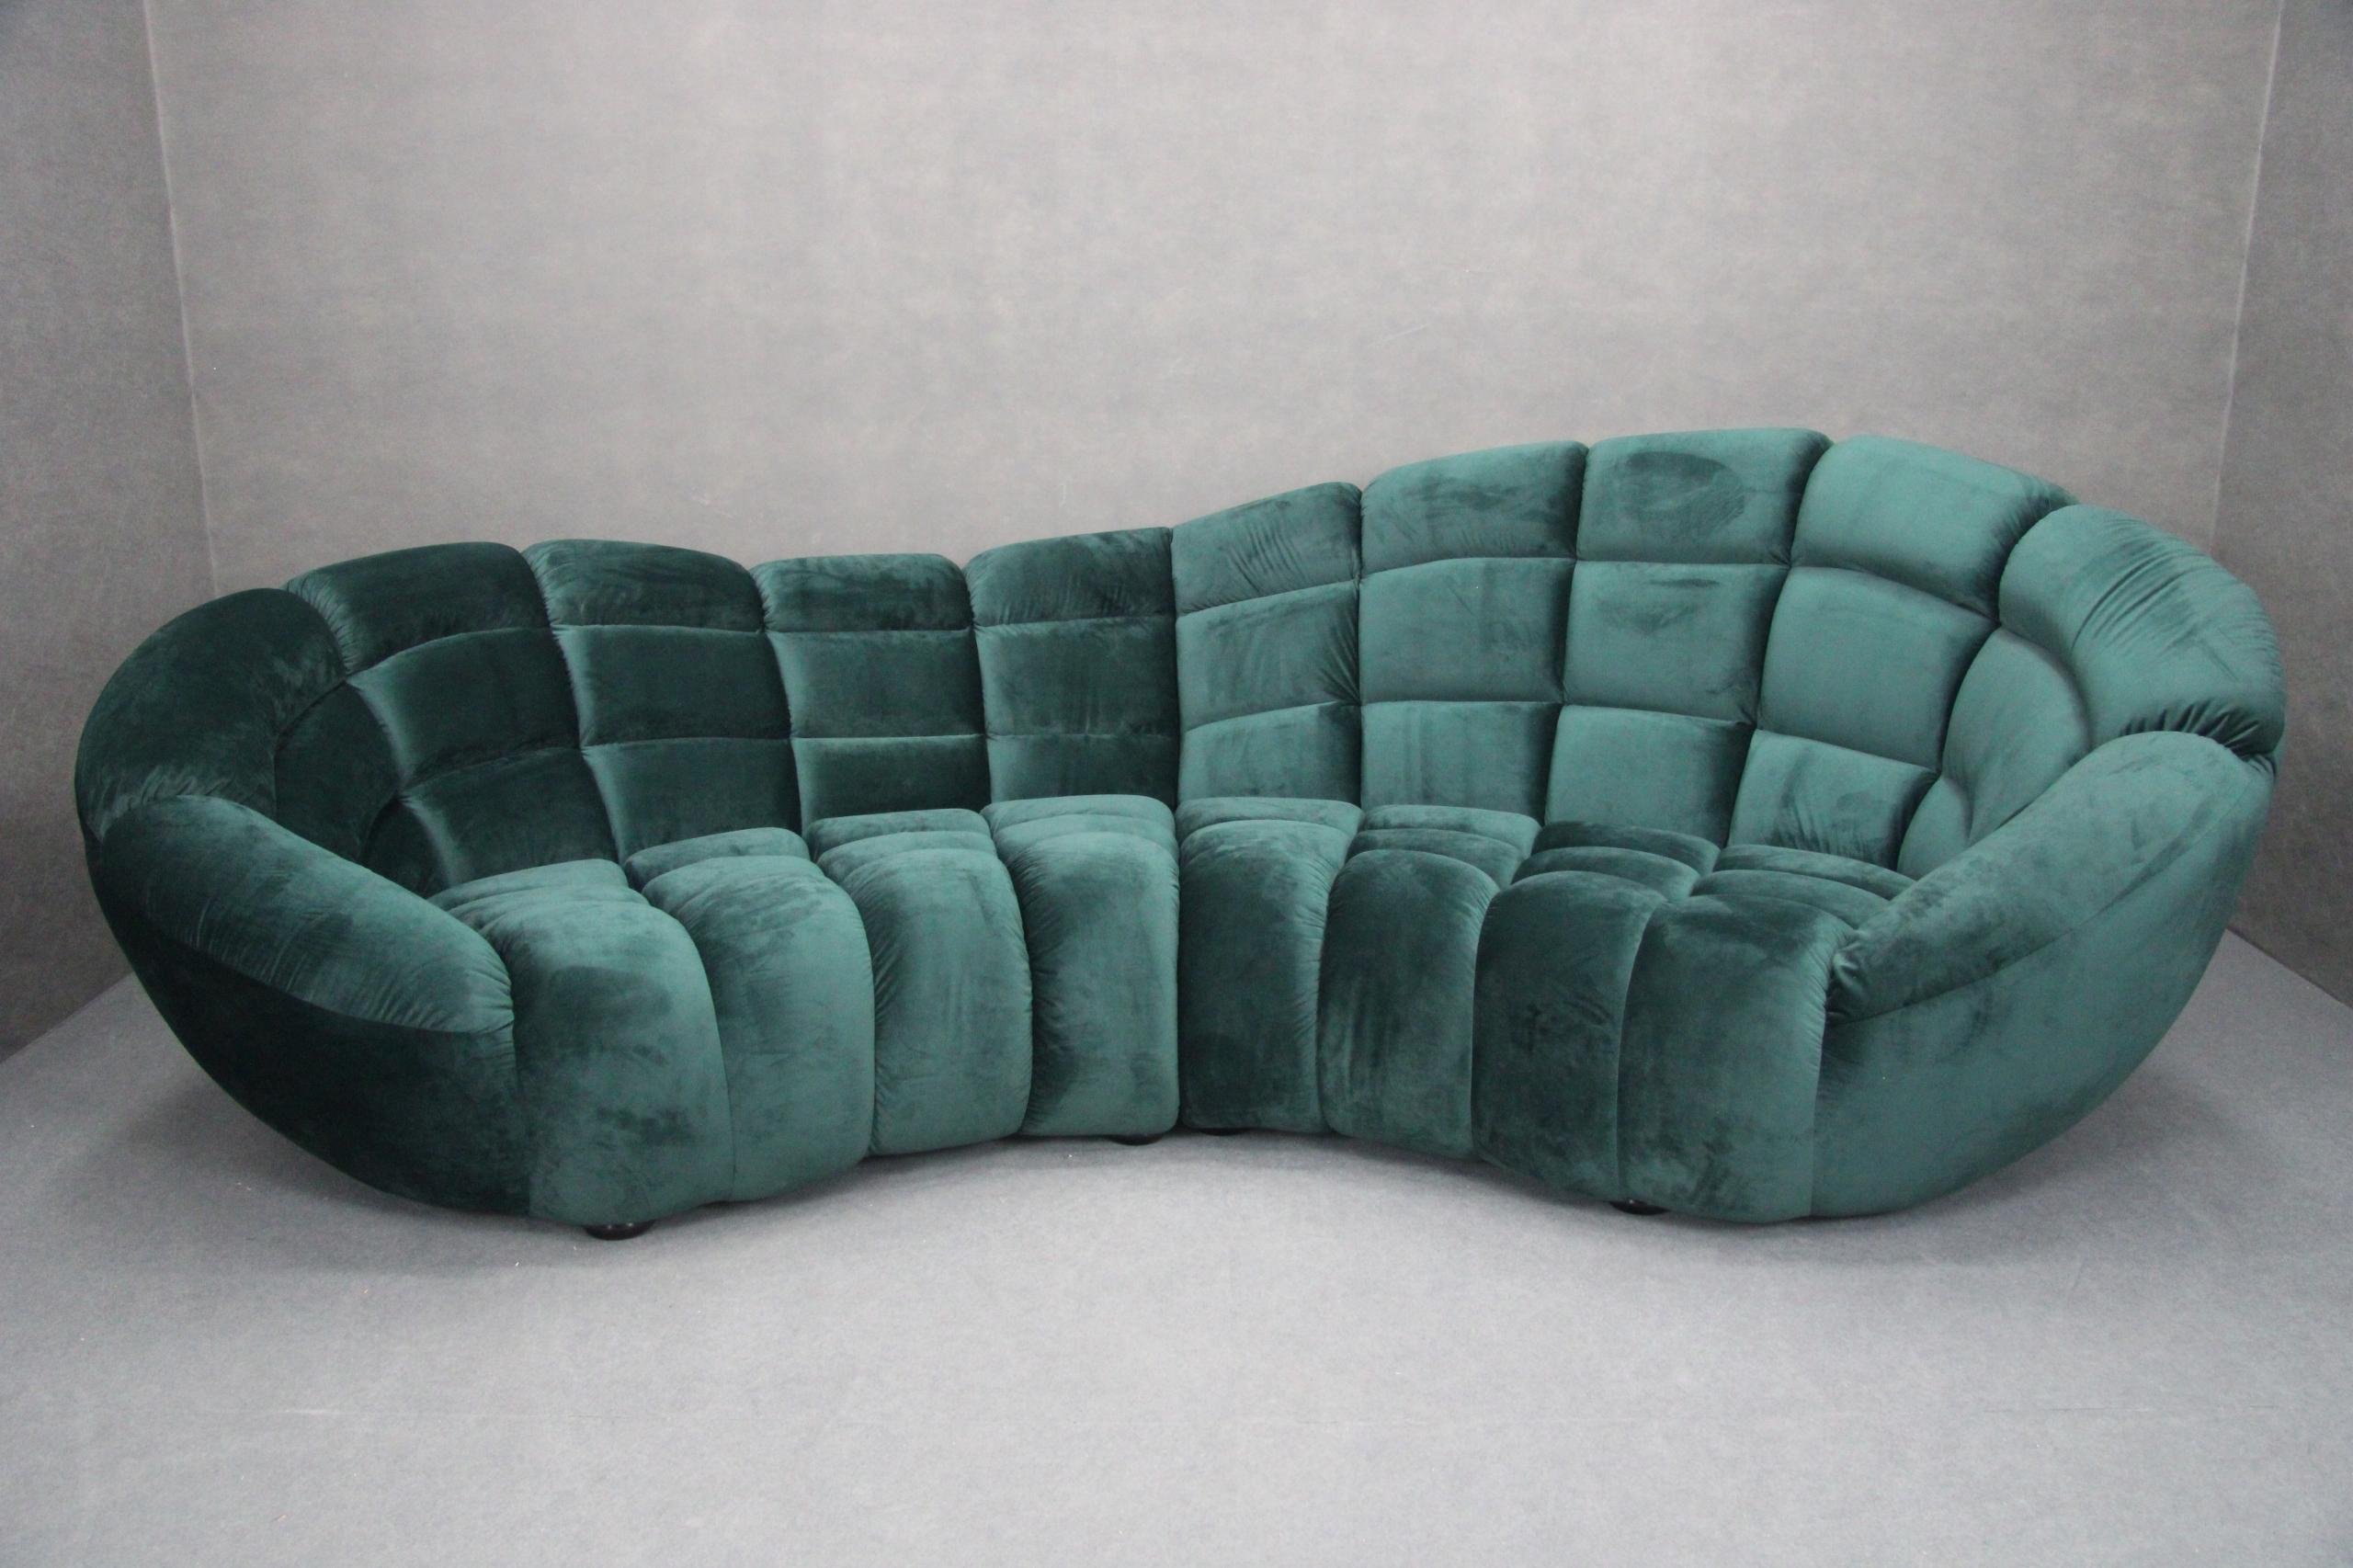 Pohovka-gauč rozkladací Gauč-Zelený Ovál RETRO DRZÝ Zelená